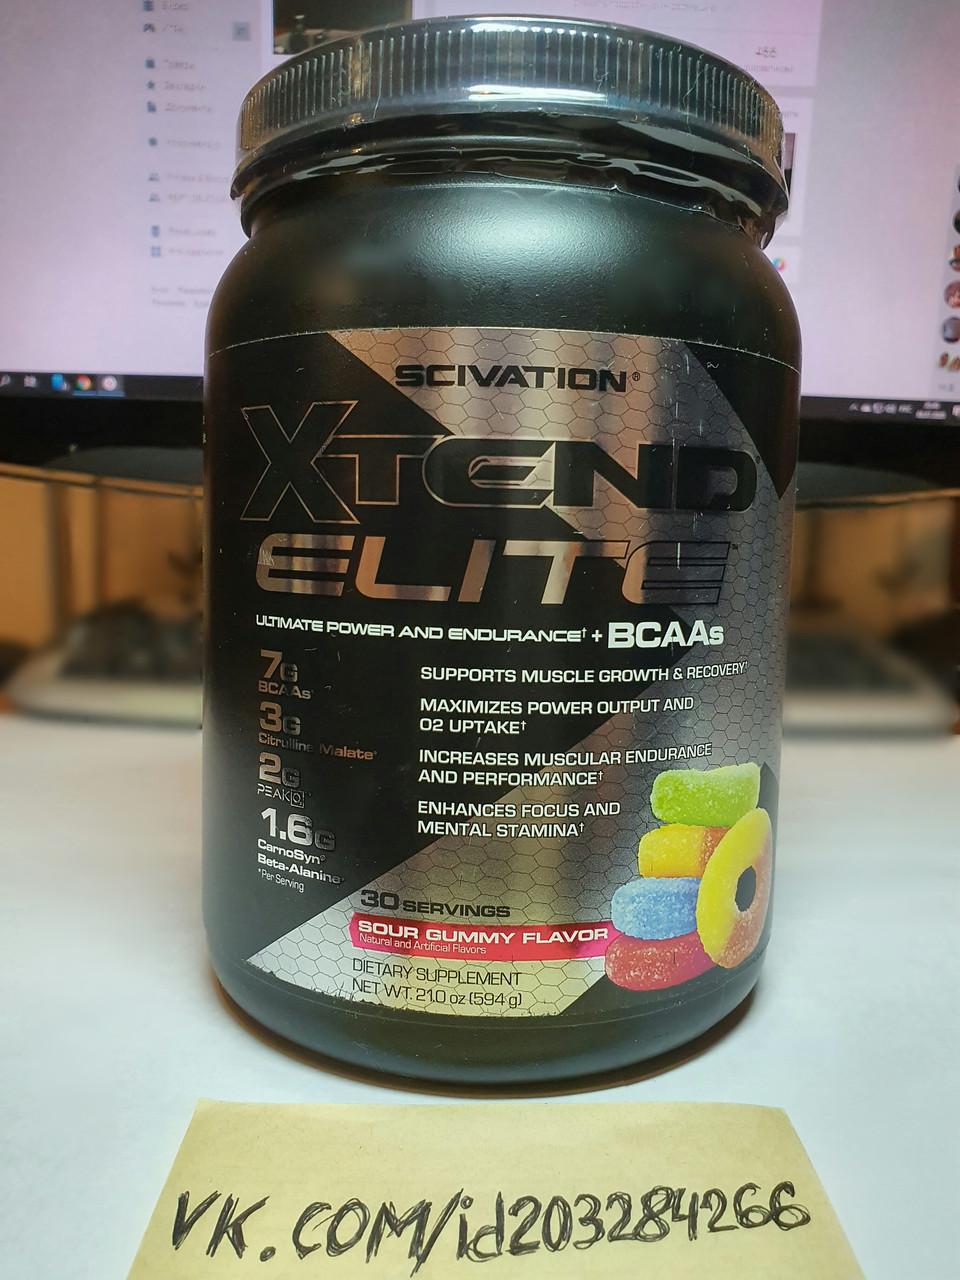 Аминокислоты BCAA Scivation Xtend Elite 594g